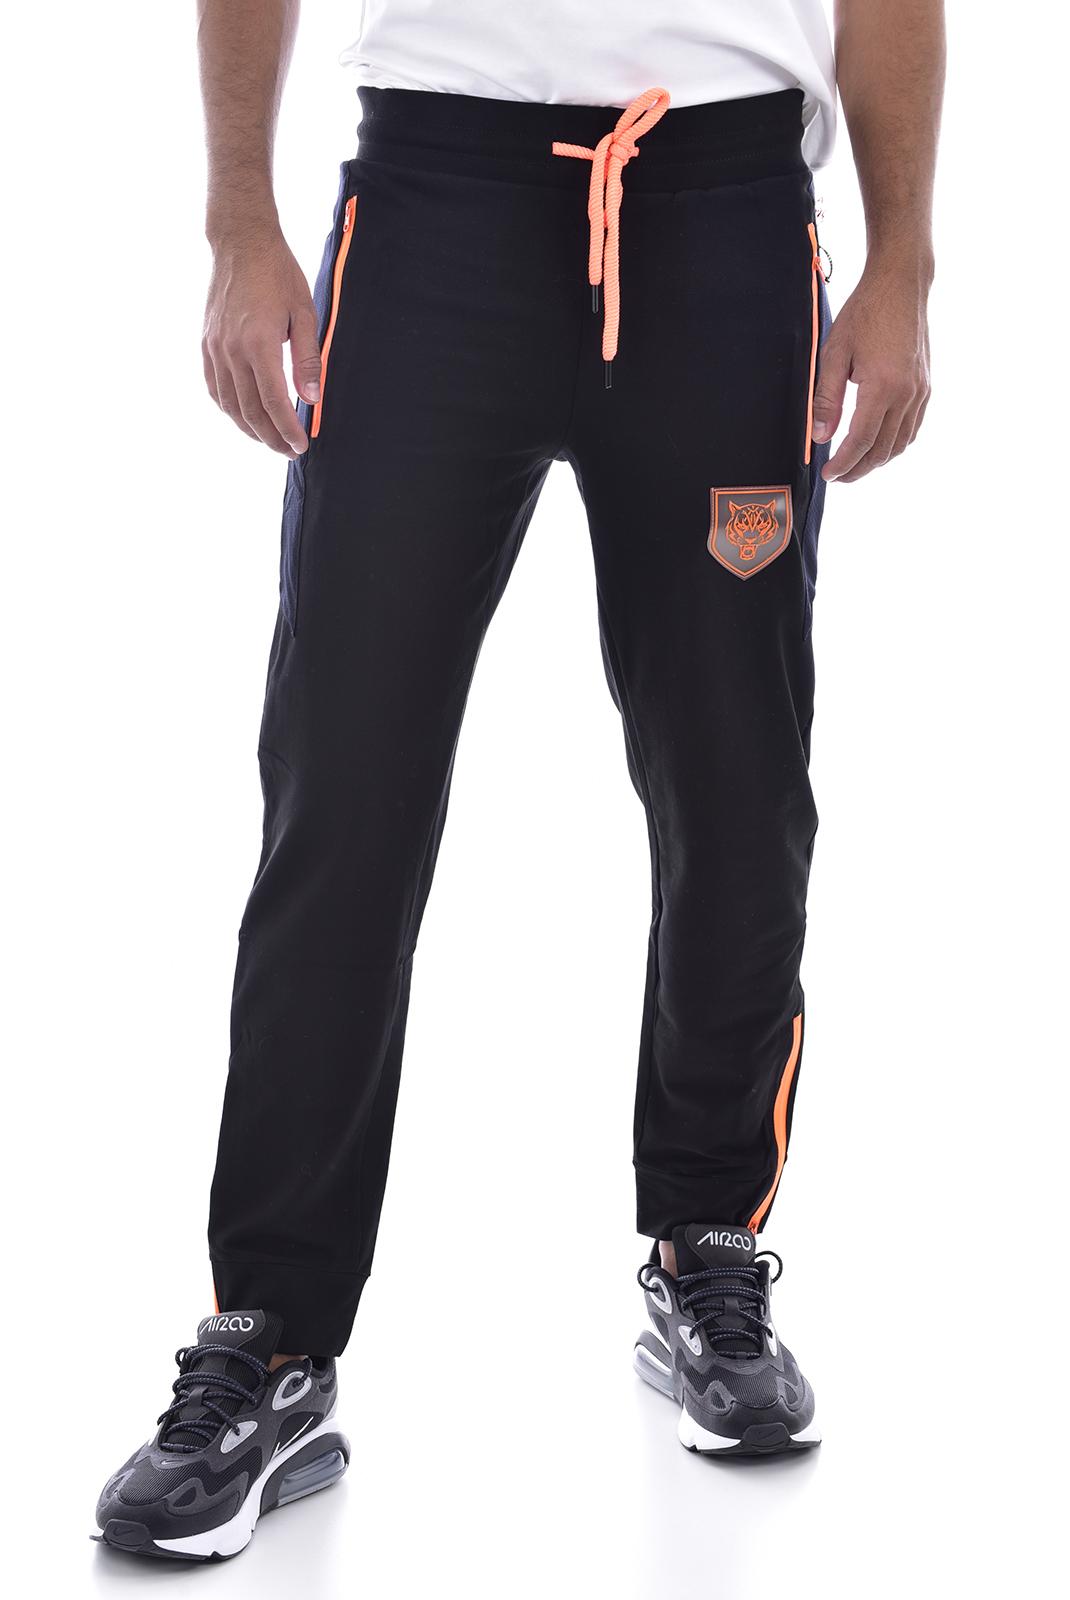 Pantalons sport/streetwear  Plein Sport MJT0460 BLACK/ORANGE